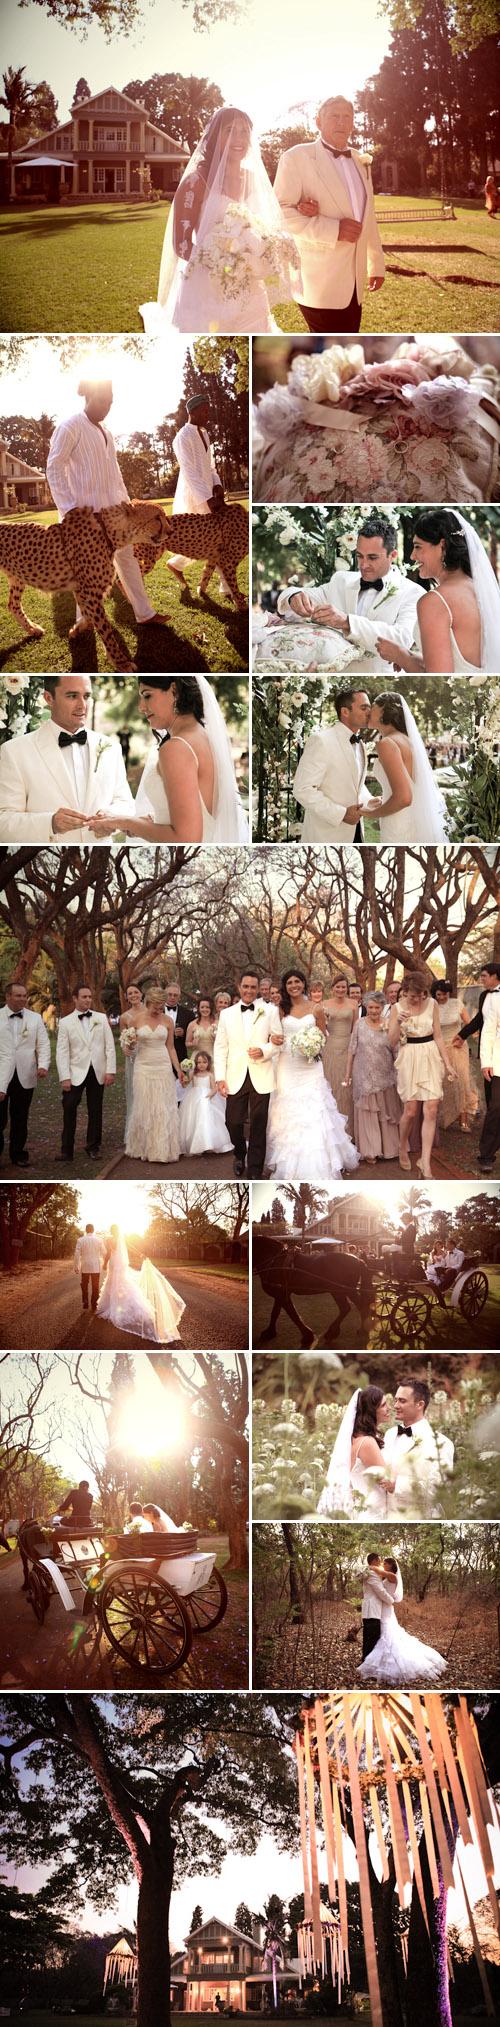 Swan Lake Inspired Wedding In Harare Zimbabwe Junebug Weddings,Grandmother Bride Dress Wedding Pant Suits For Grandmothers